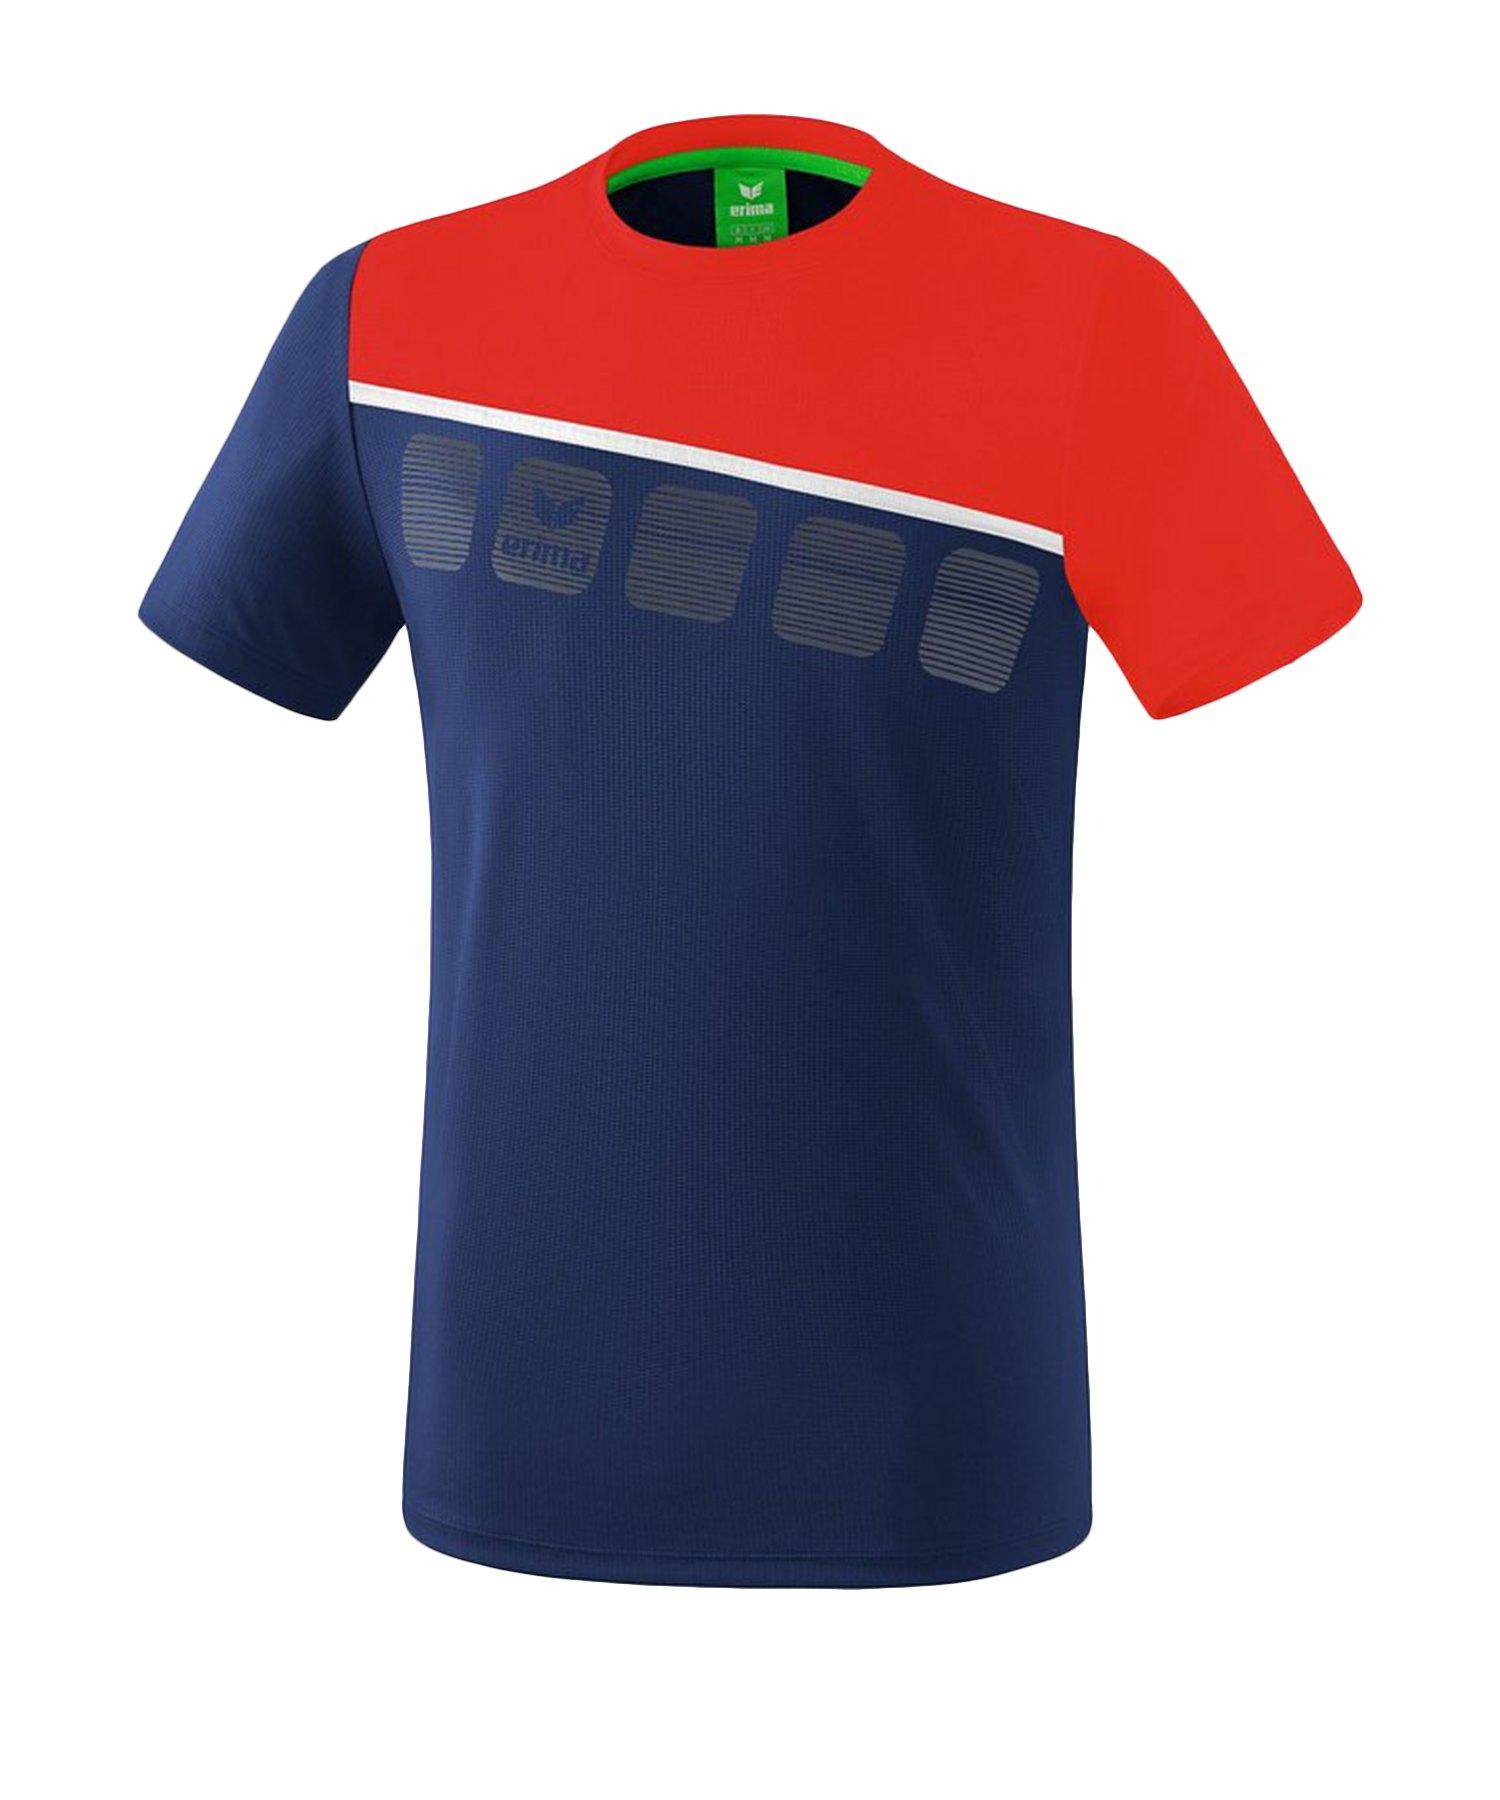 Erima 5-C T-Shirt Kids Blau Rot - Blau